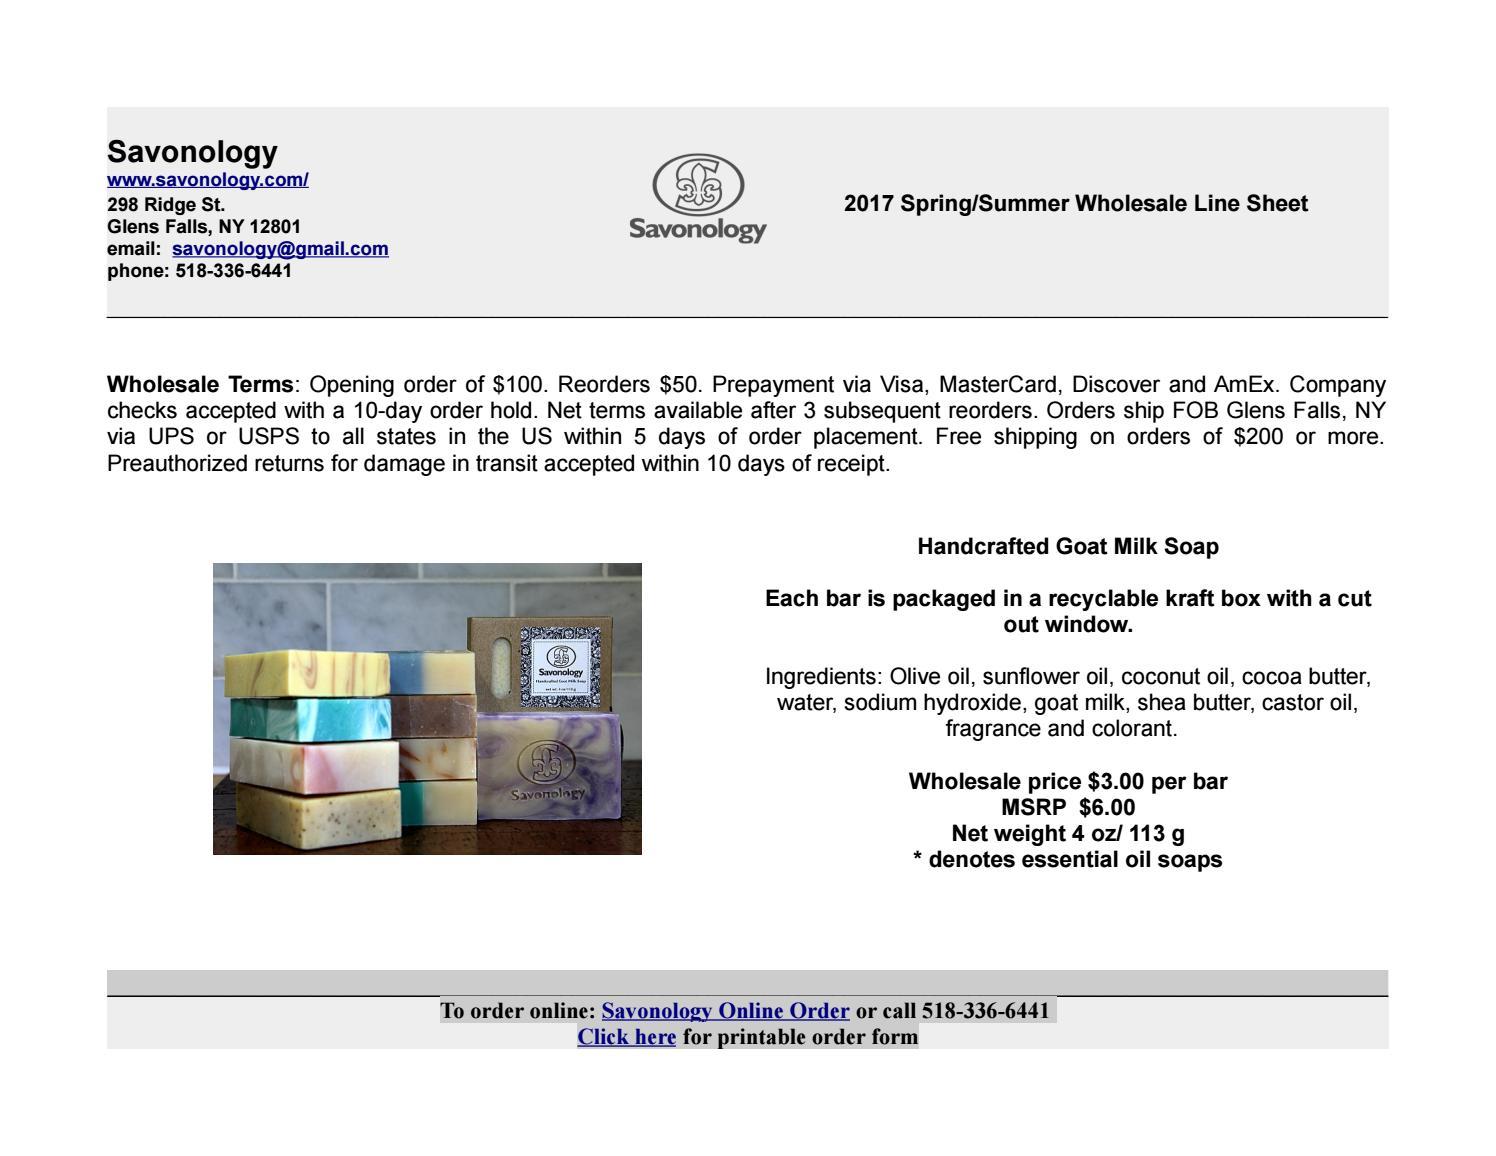 Savonology Wholesale Linesheet 2017 by Savonology - issuu